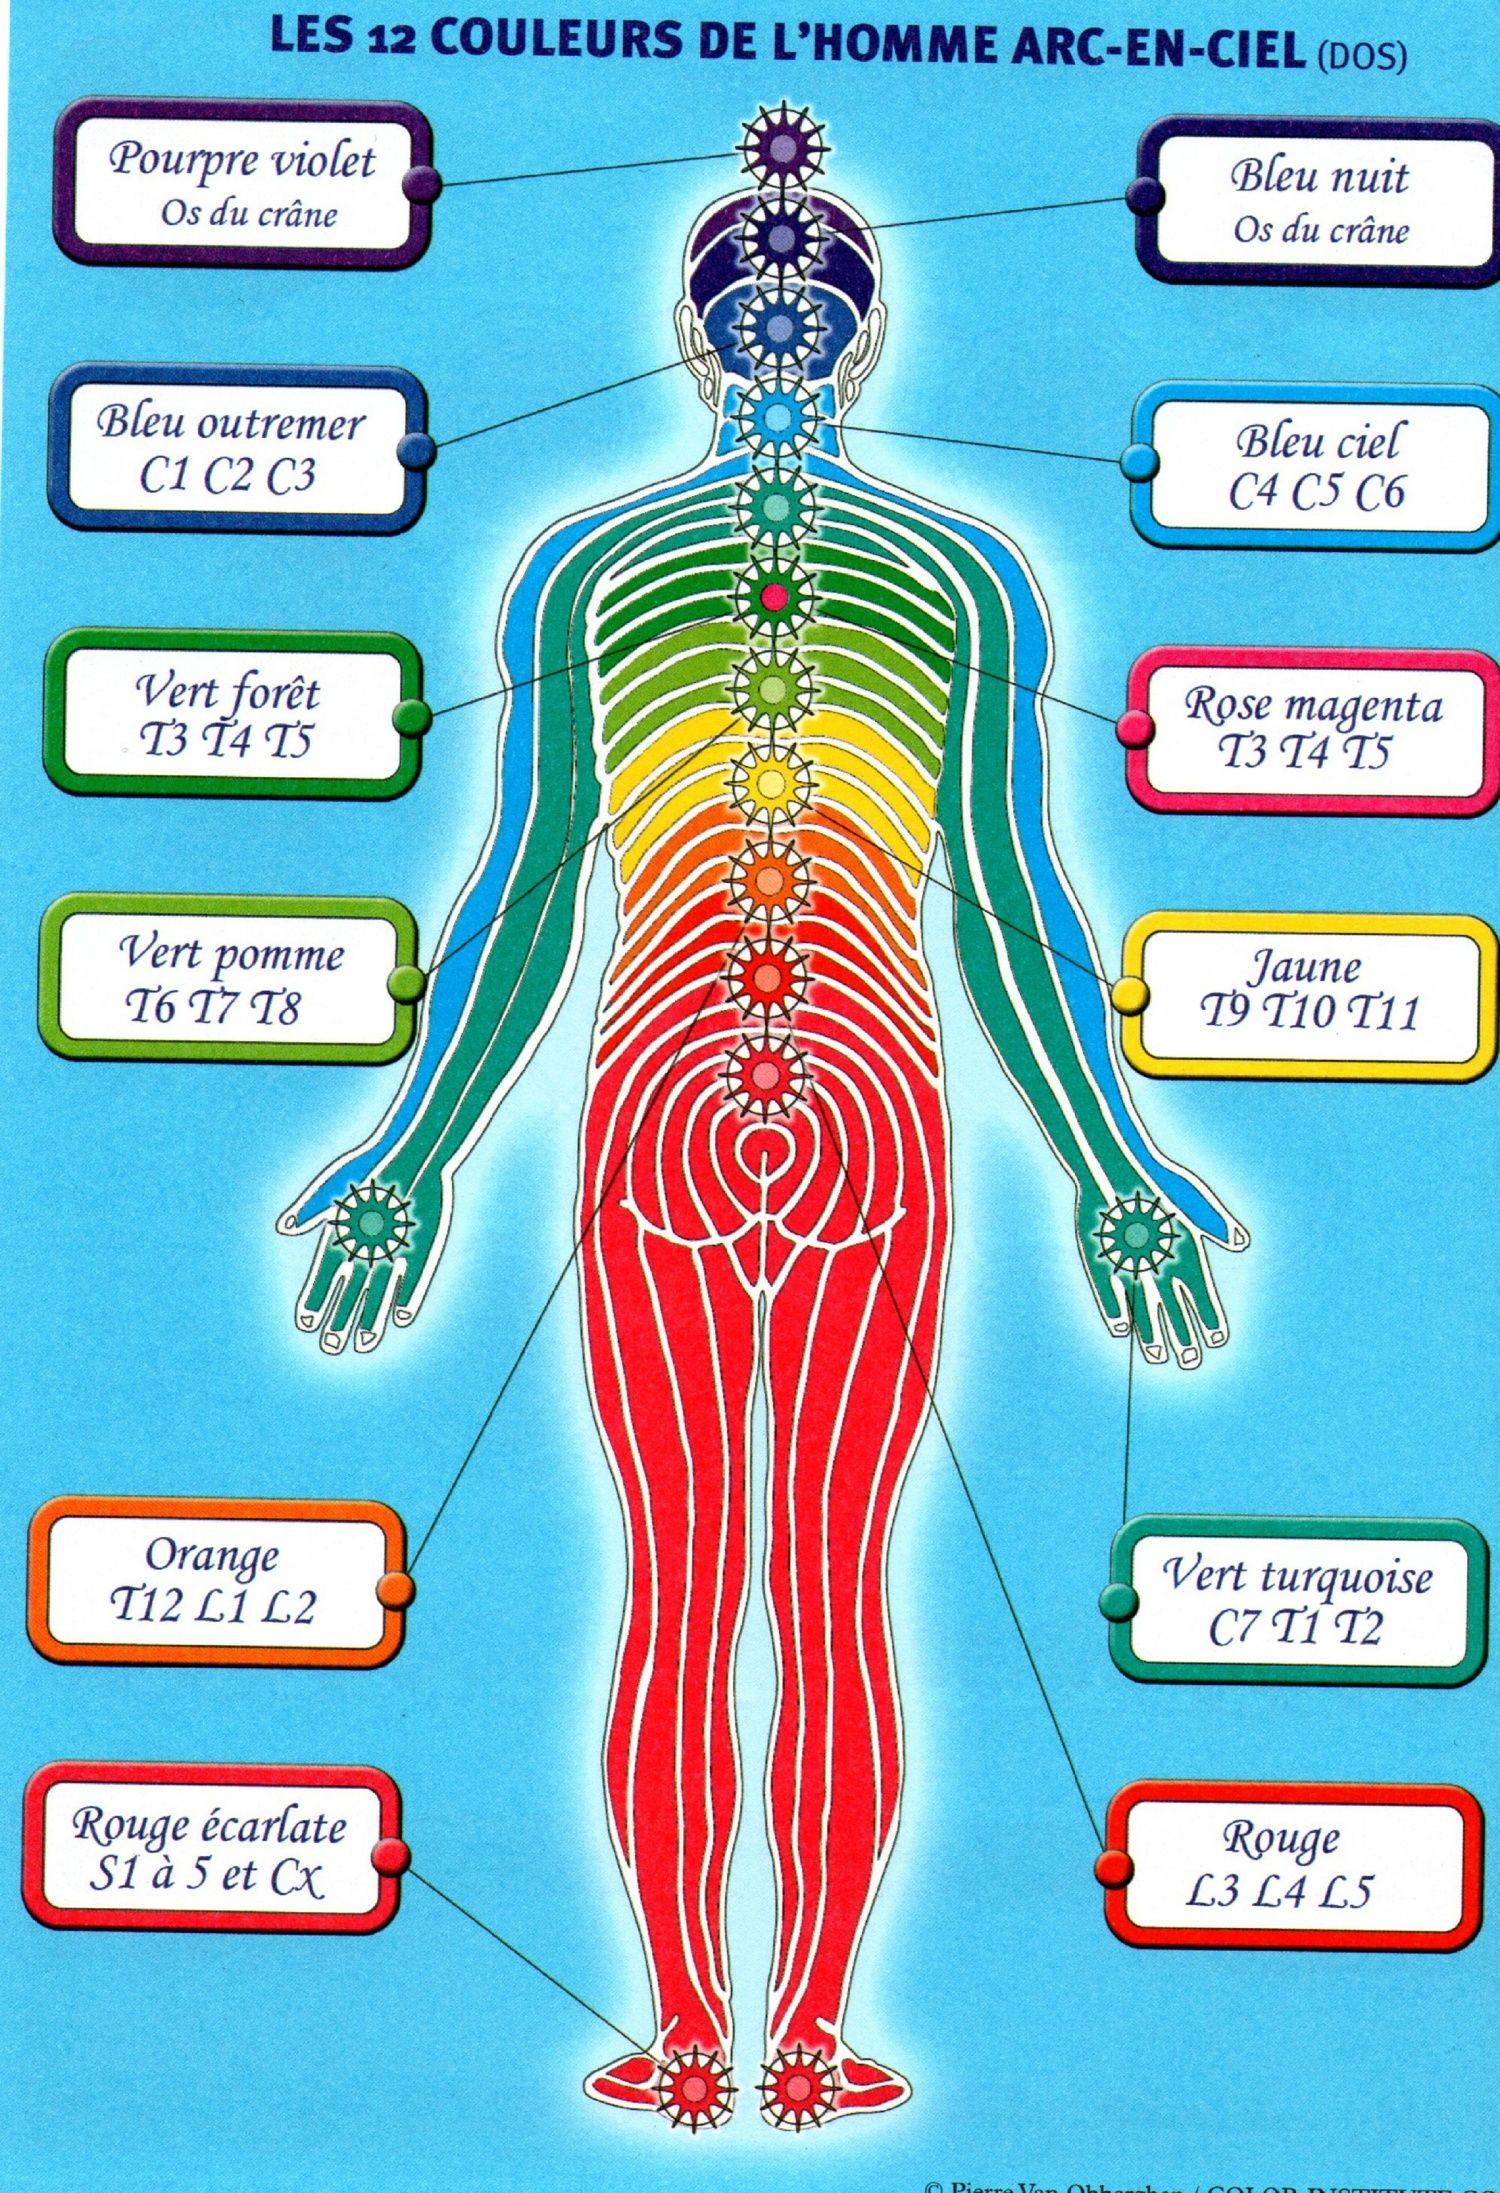 Hervorragend les chakras | Serenite | Pinterest | Méditation, Spiritualité et  CR79